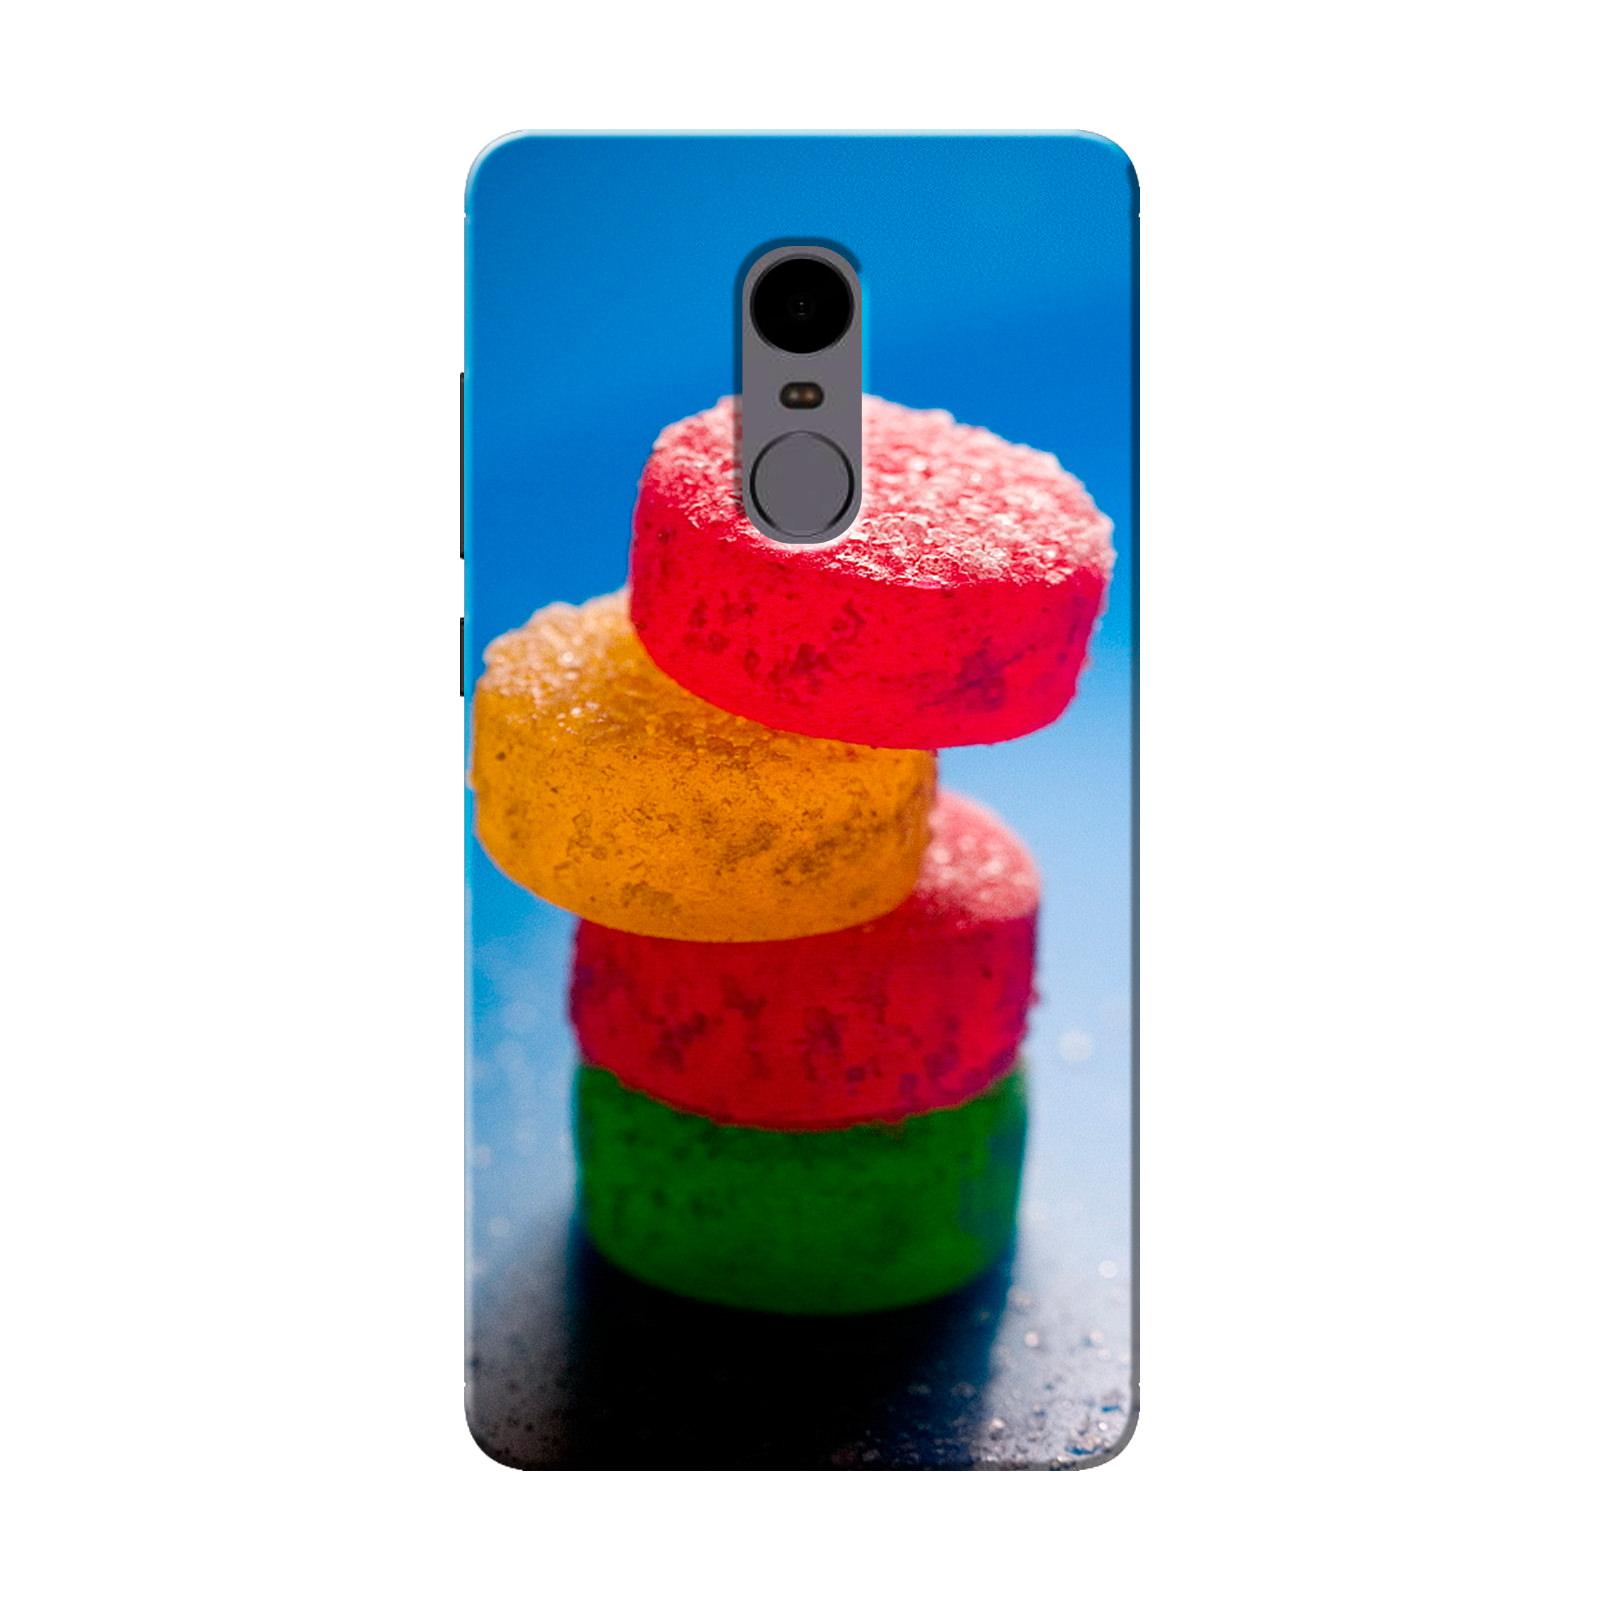 sairafashions Wild Thunder Mi Redmi Note 4 Mobile Back Cover Case And Designer Printed Hard Flexible Mobile Case Cover  - 1096